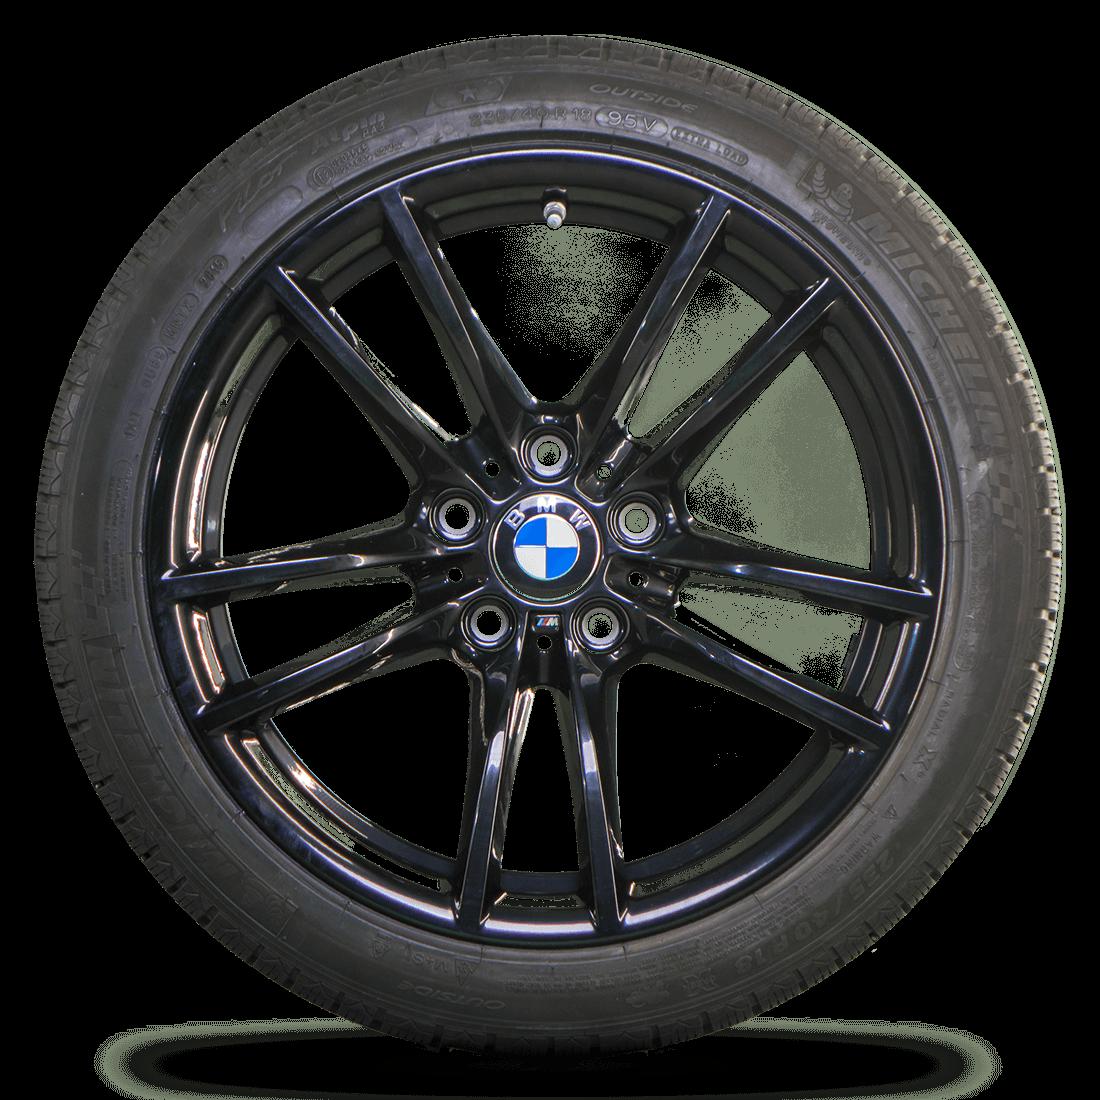 18 Inch Tires >> Bmw 18 Inch Rims Winter Wheels 2er M2 F87 M640 Winter Tires Winter Complete